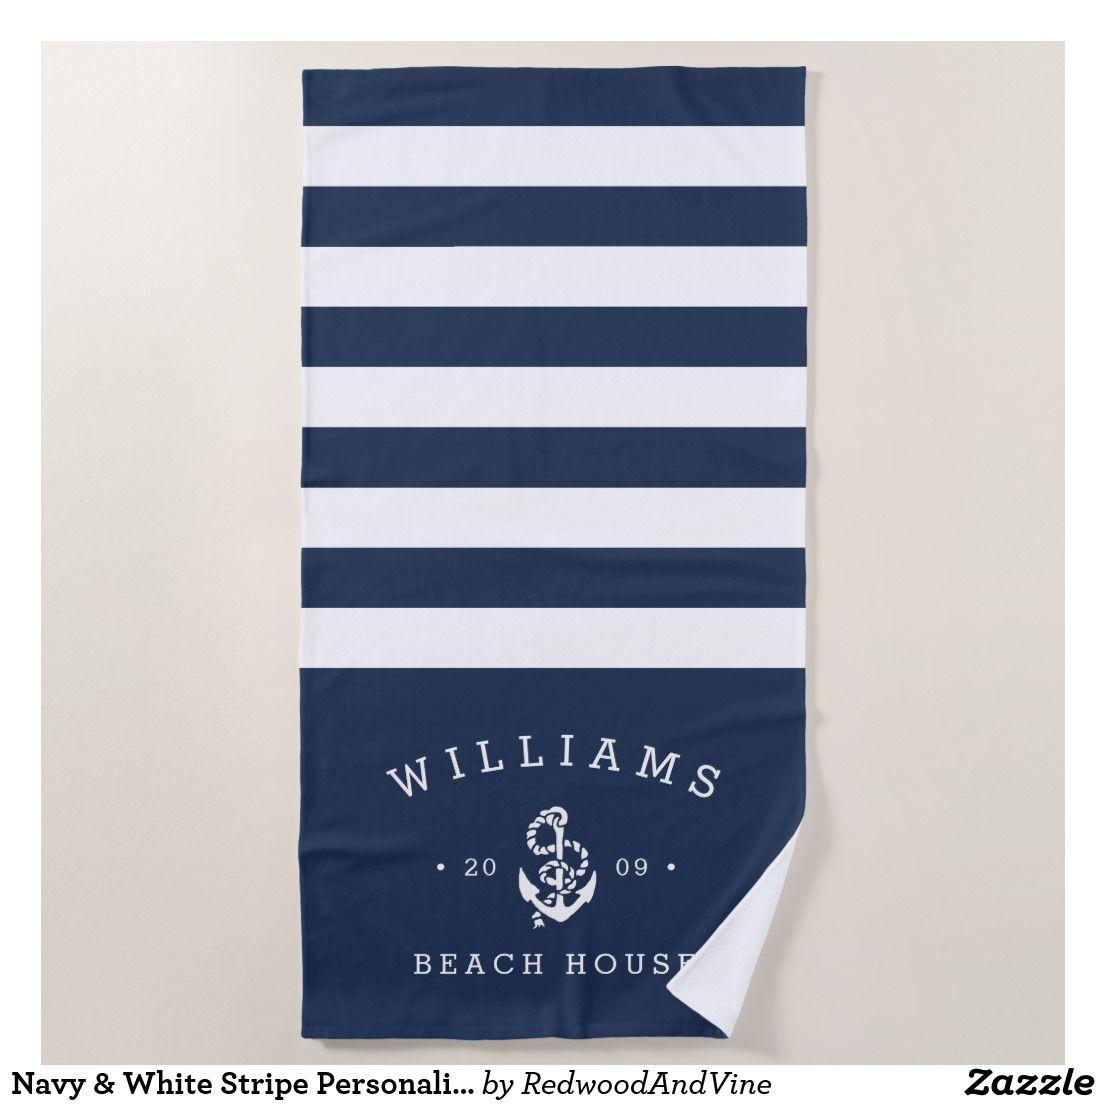 Navy White Stripe Personalized Beach House Beach Towel Zazzle